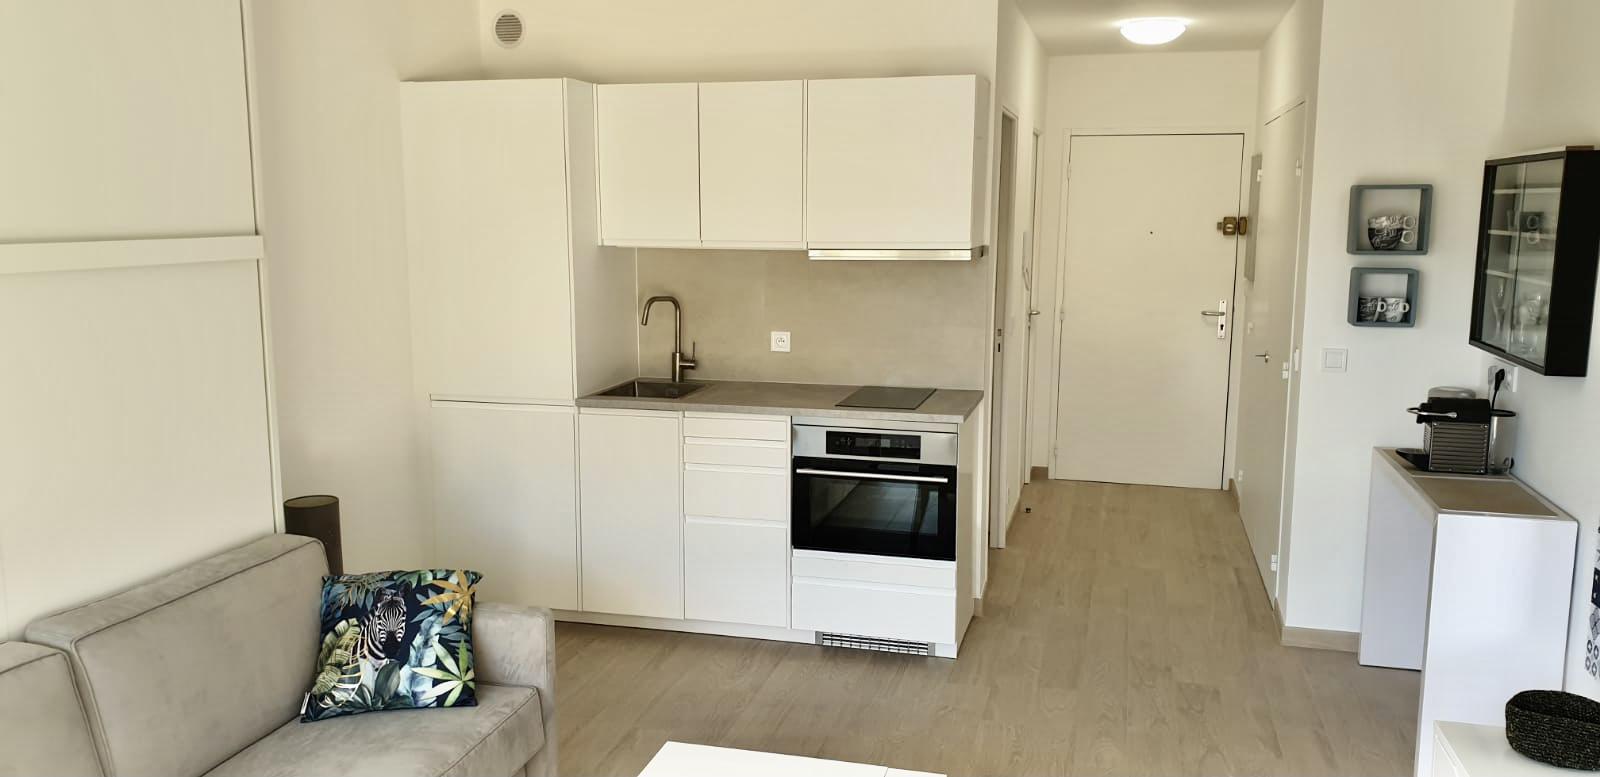 travaux-renovation-maison-appartement-antibes-061